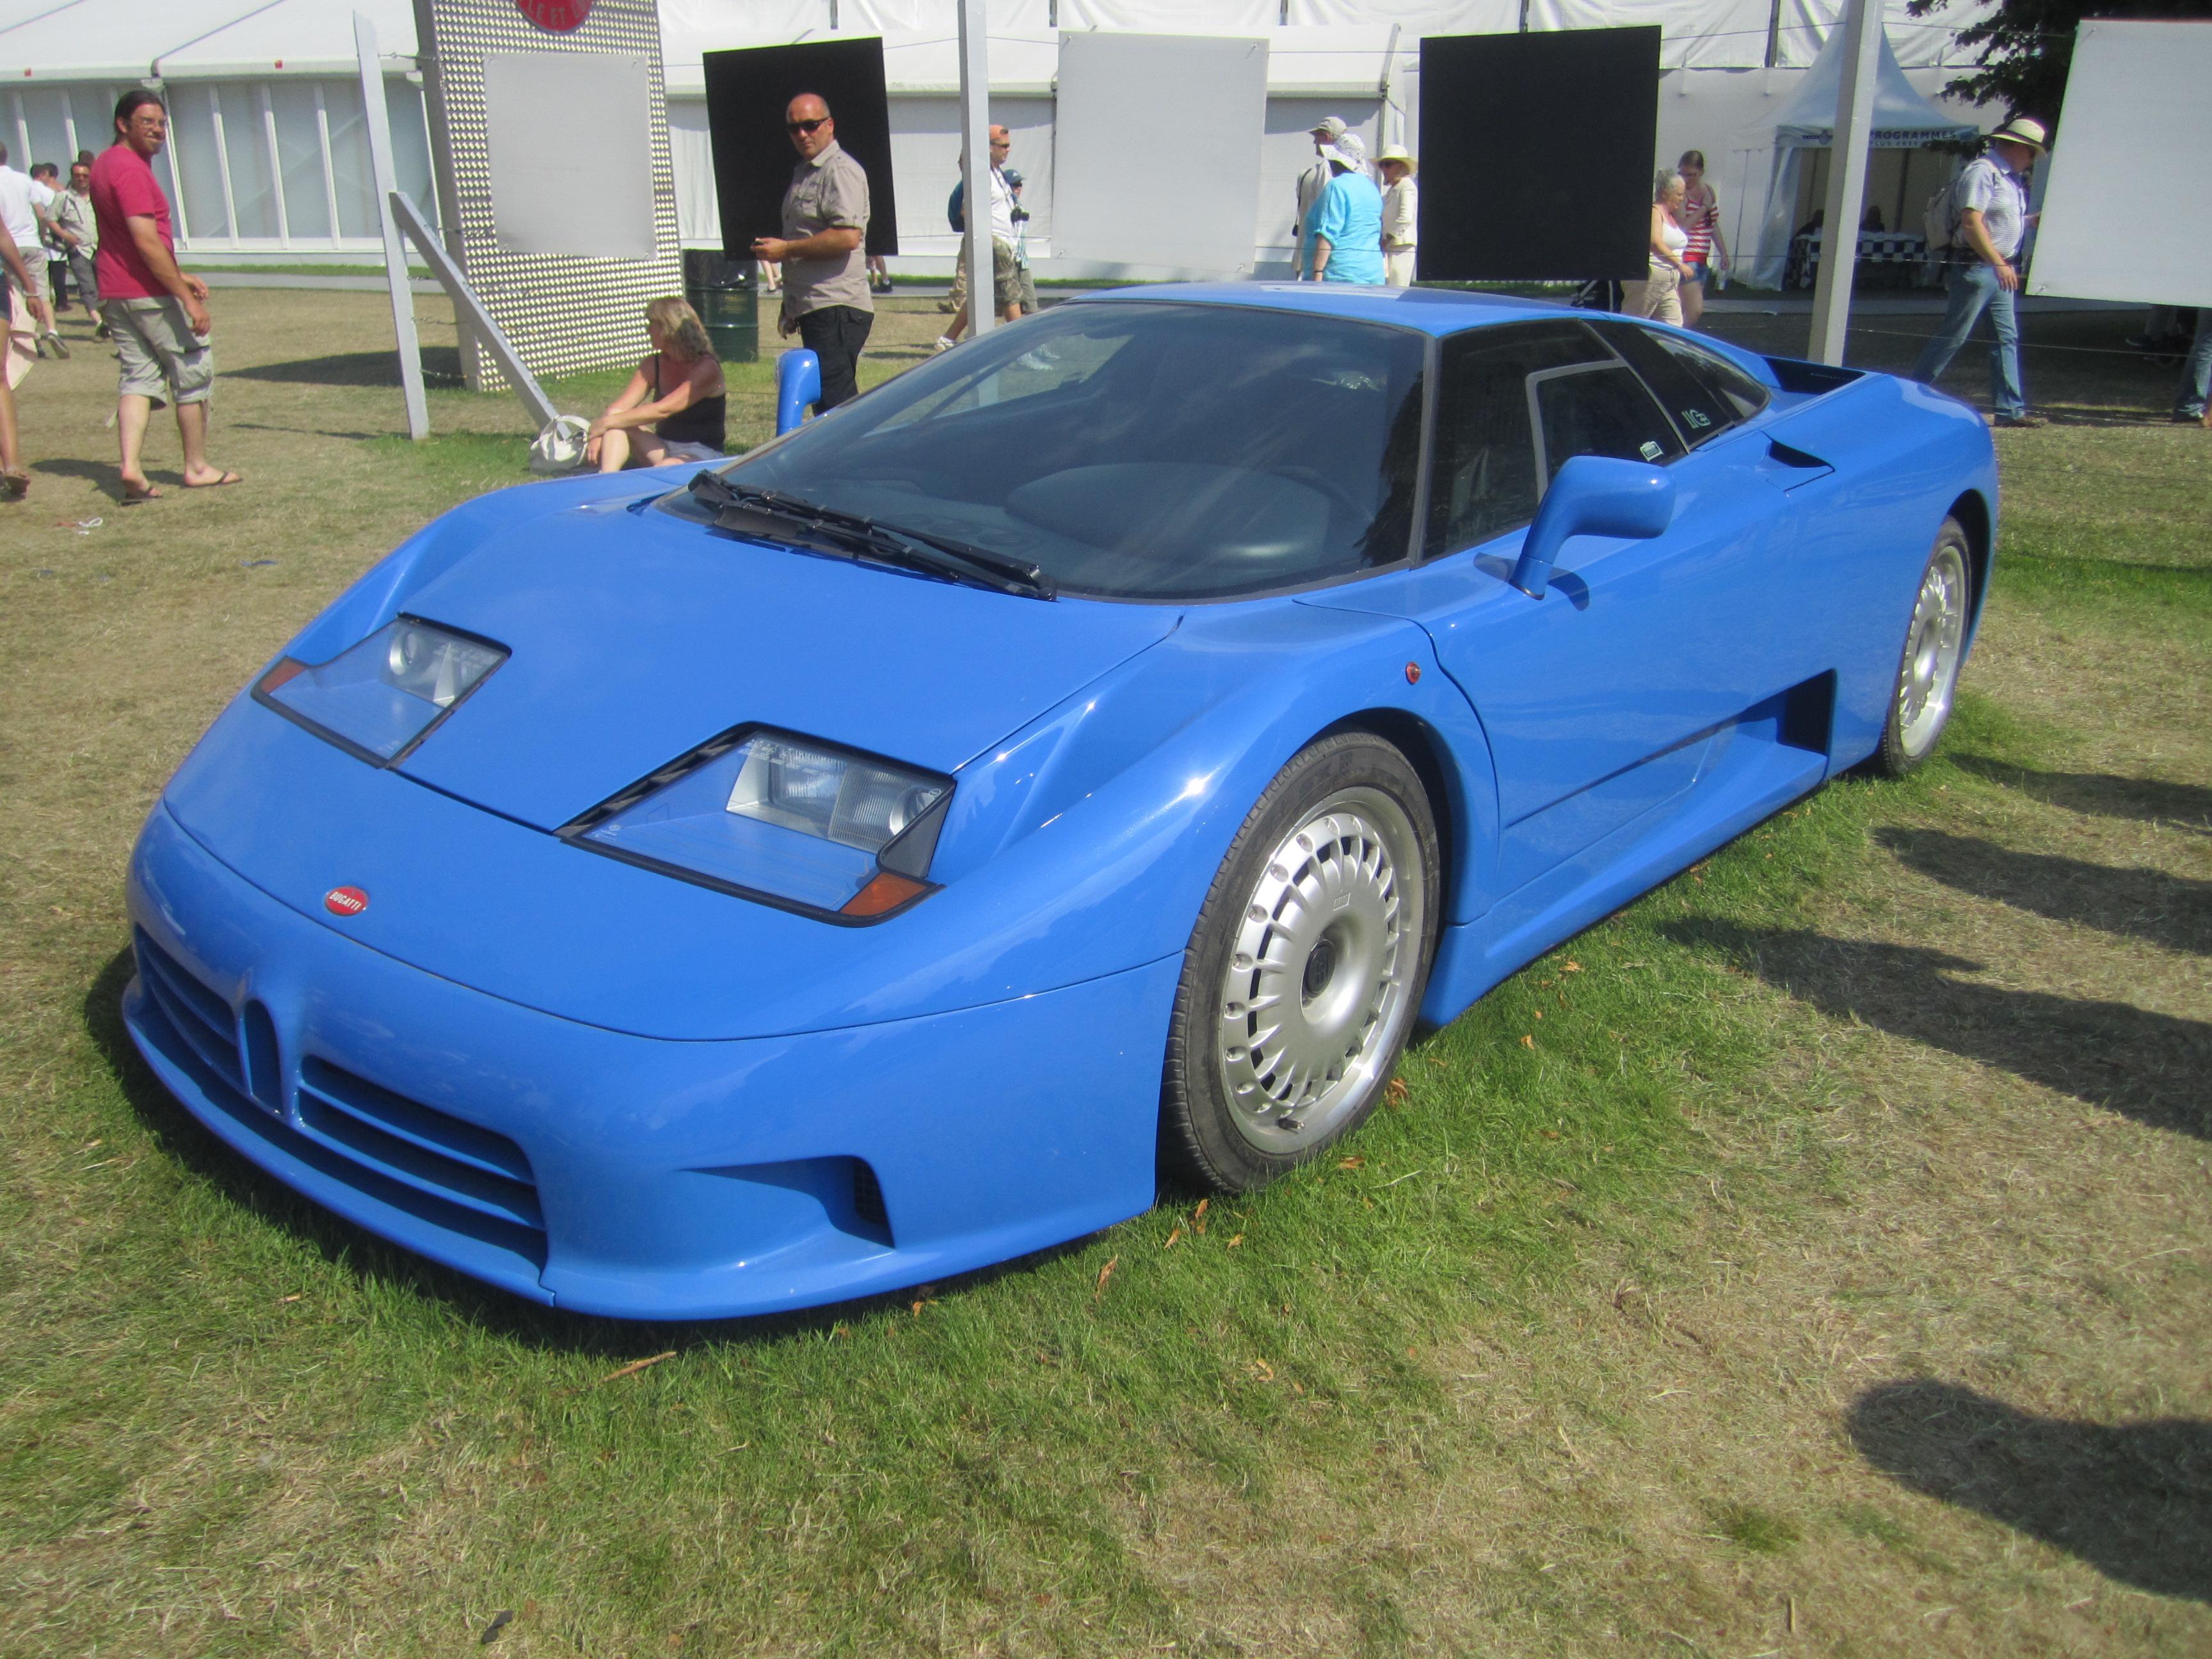 File:Bugatti EB110 GT 1991.jpg - Wikimedia Commons